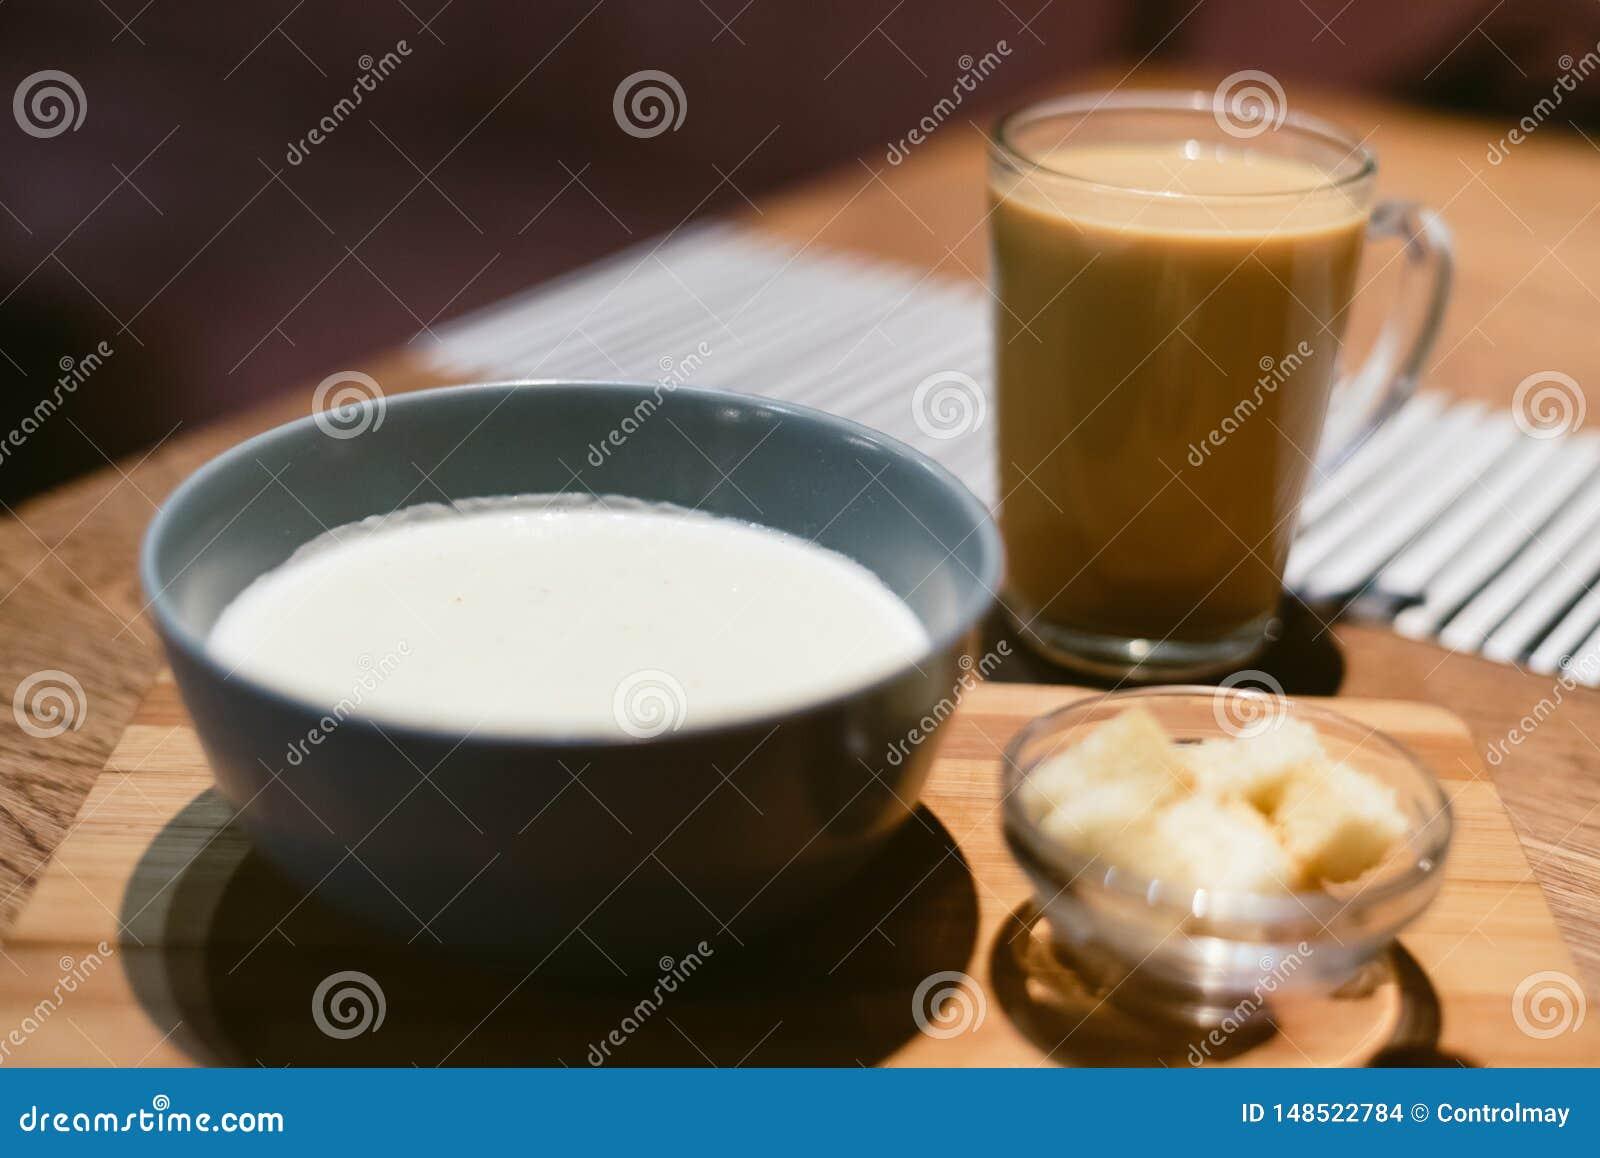 Kaassoep in een koffiewinkel met koffie